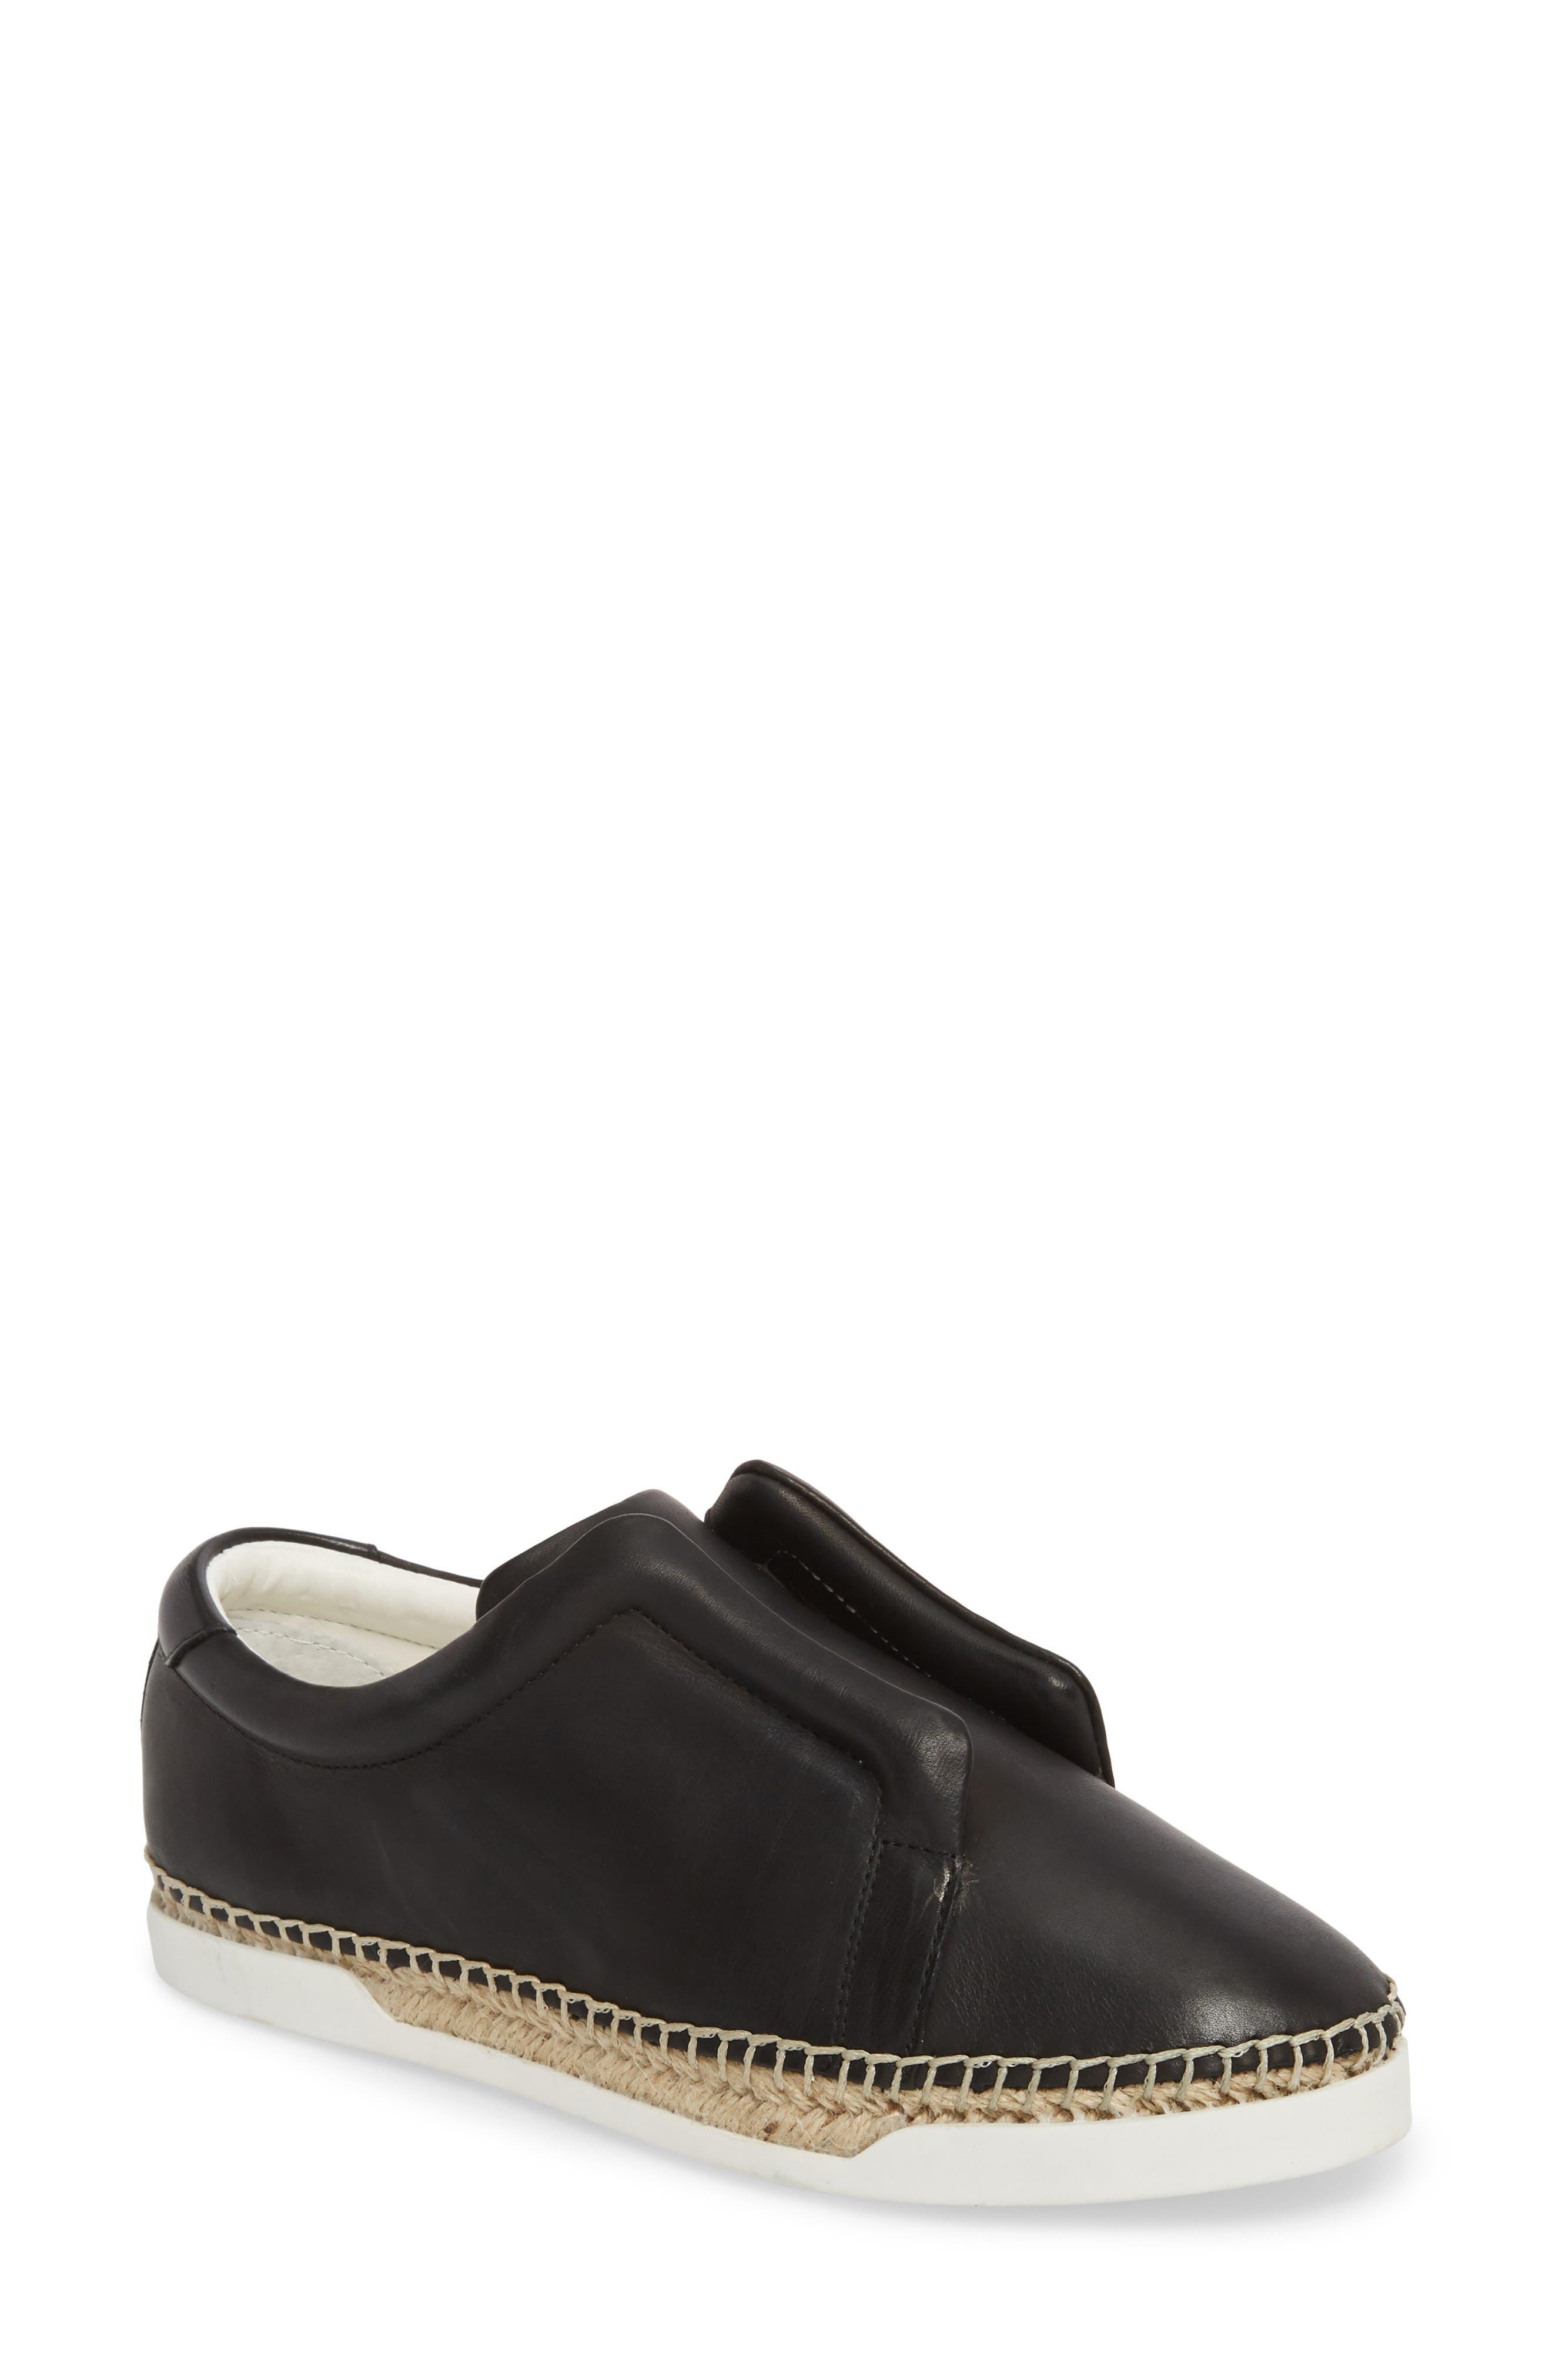 M4D3 Elizabeth Espadrille Slip-On Sneaker,                             Main thumbnail 1, color,                             BLACK LEATHER